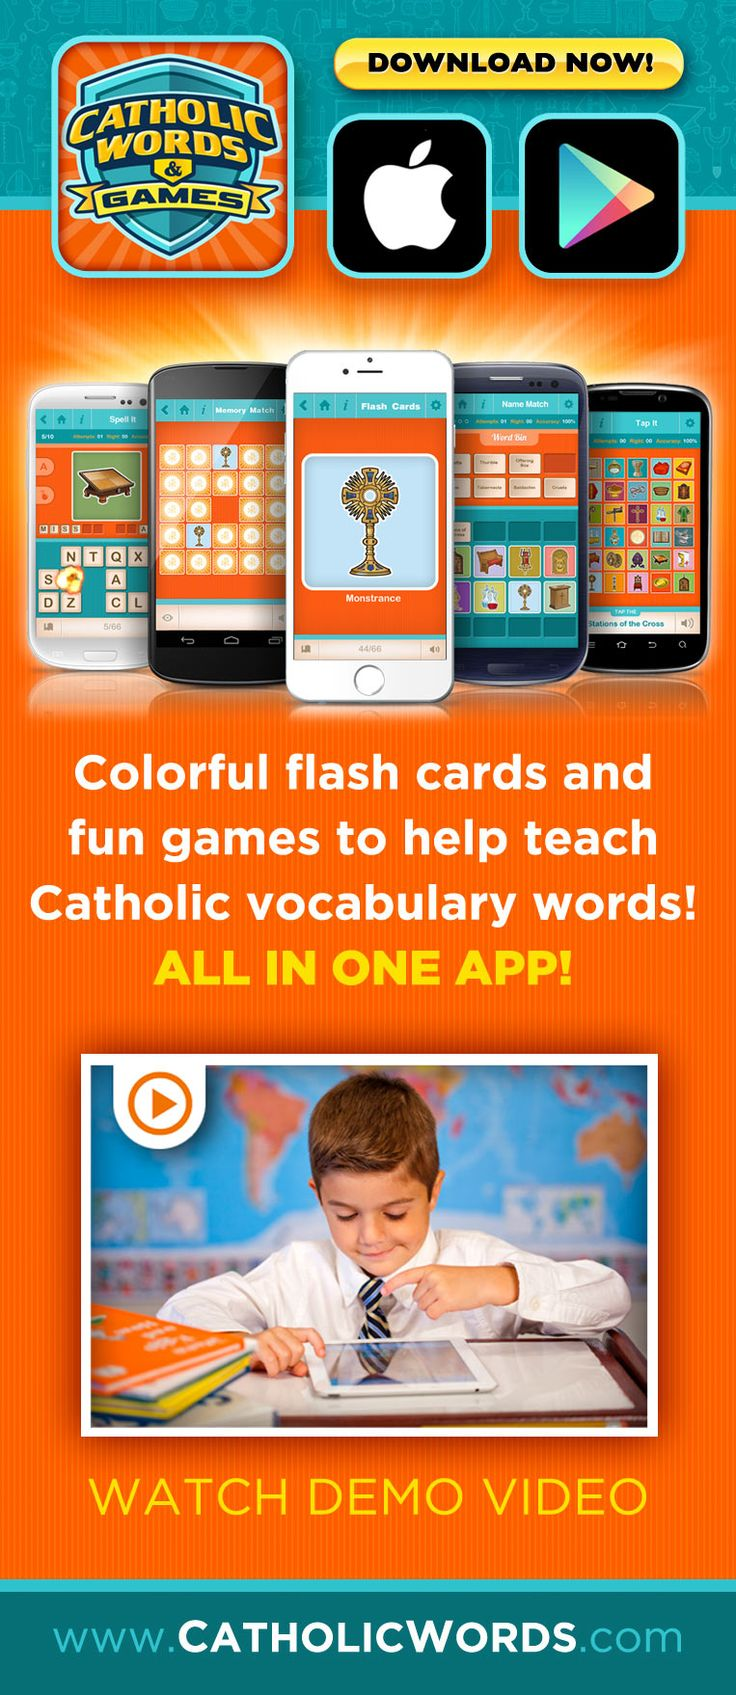 A fun app to teach Catholic